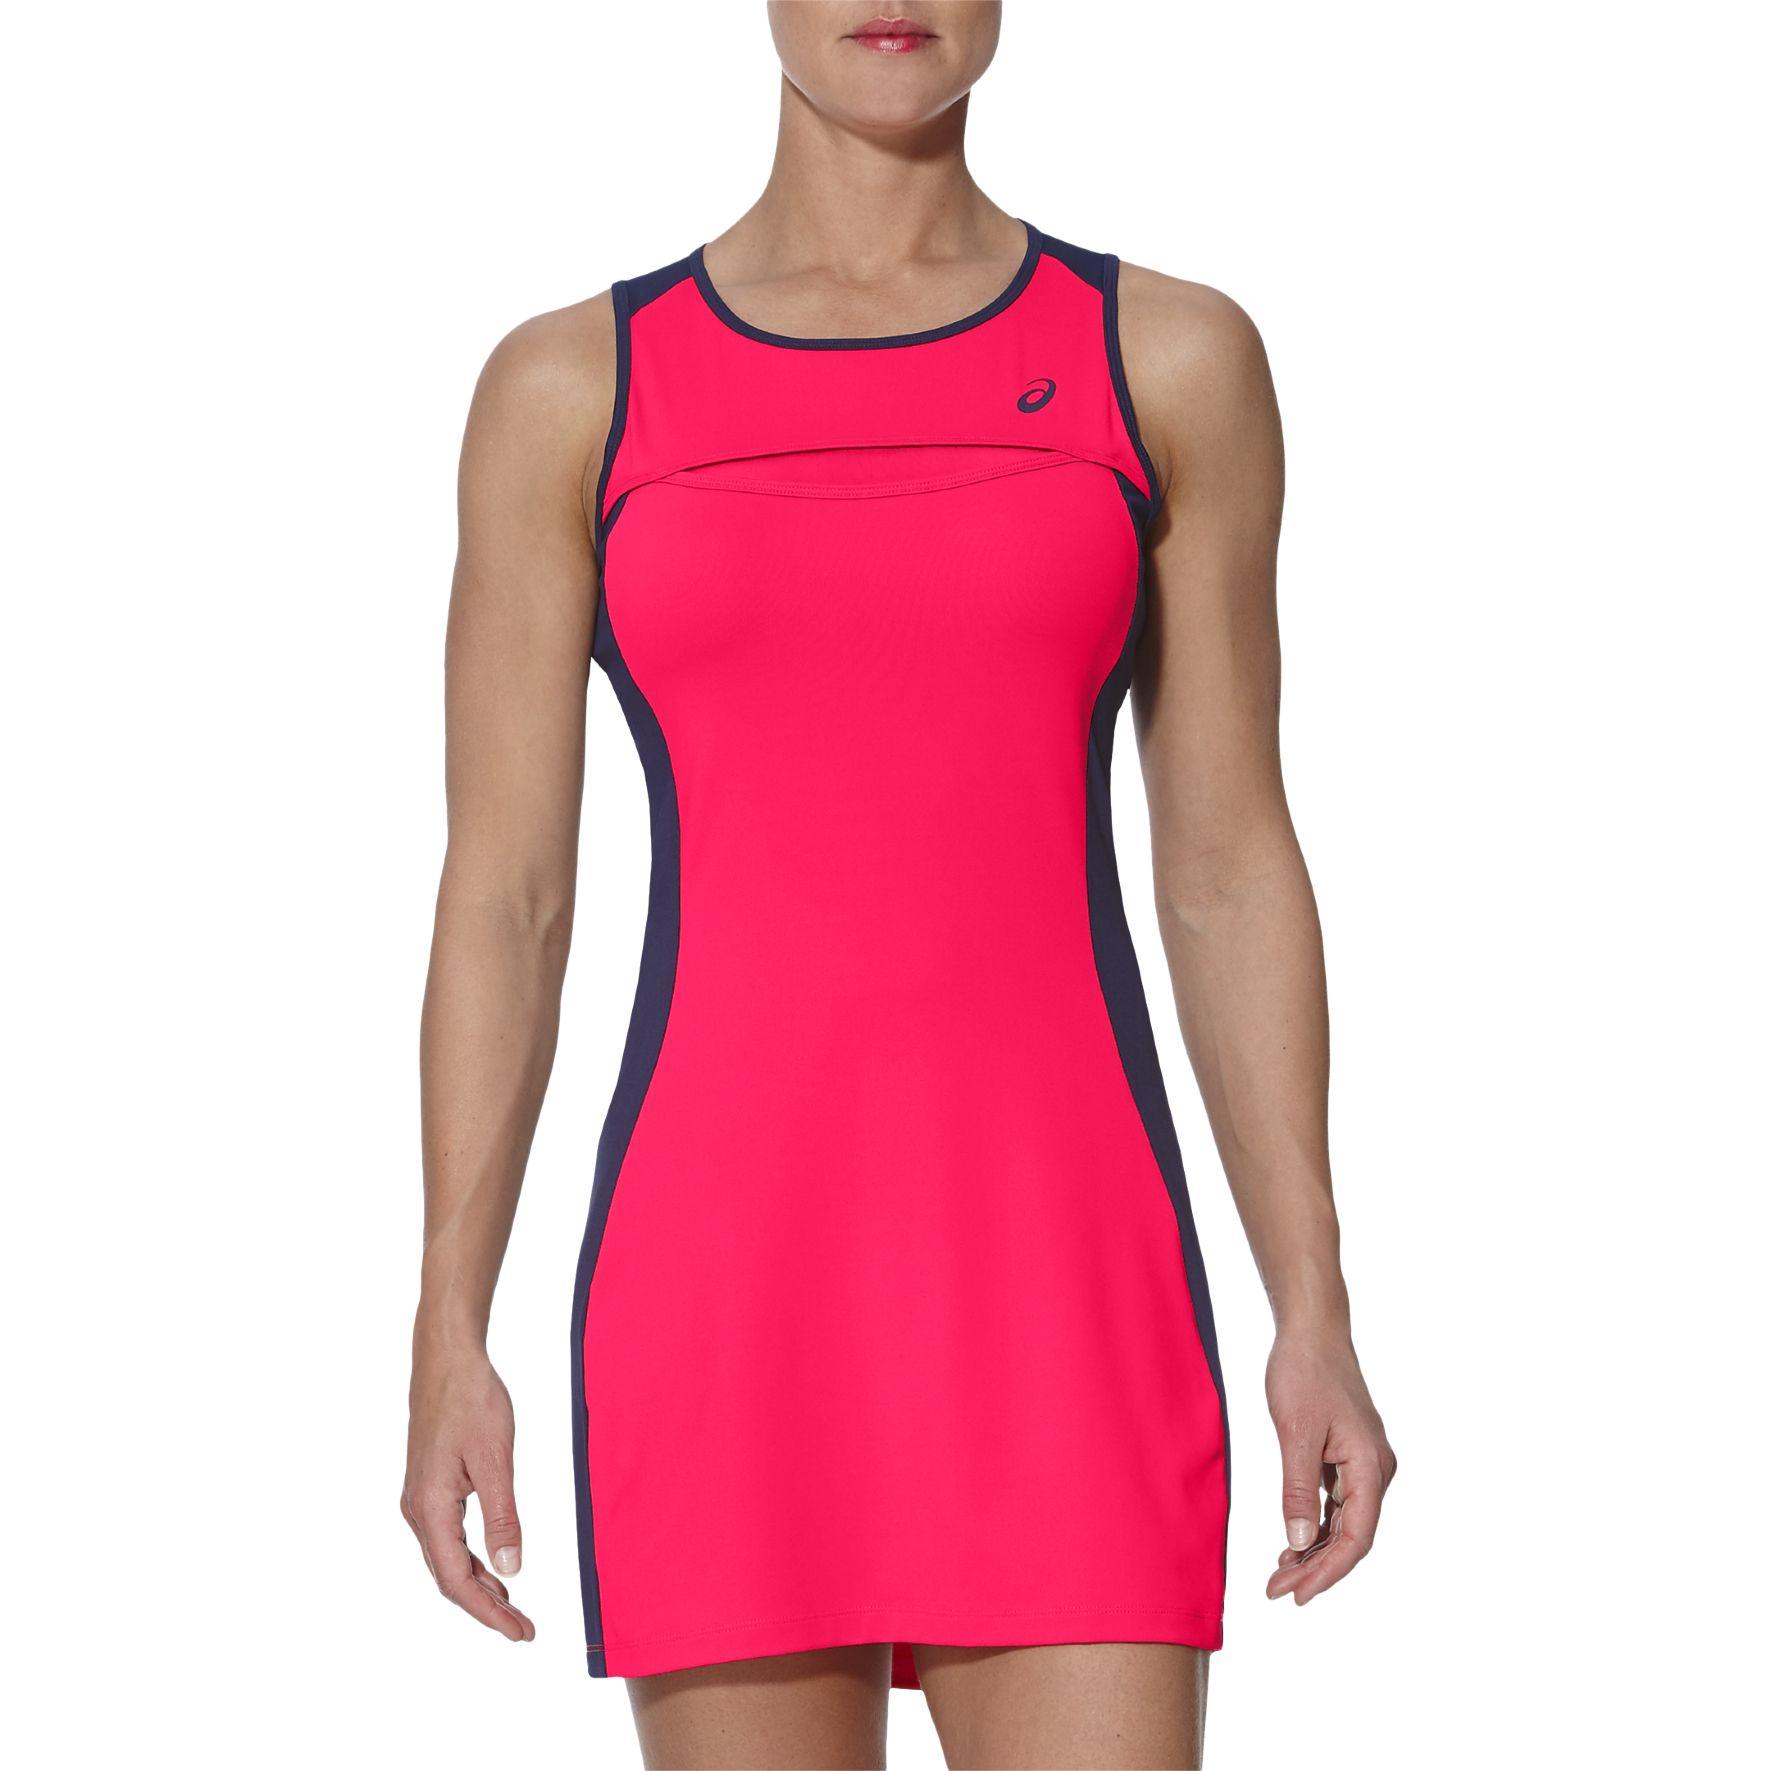 Asics Club Ladies Tennis Dress - Sweatband.com